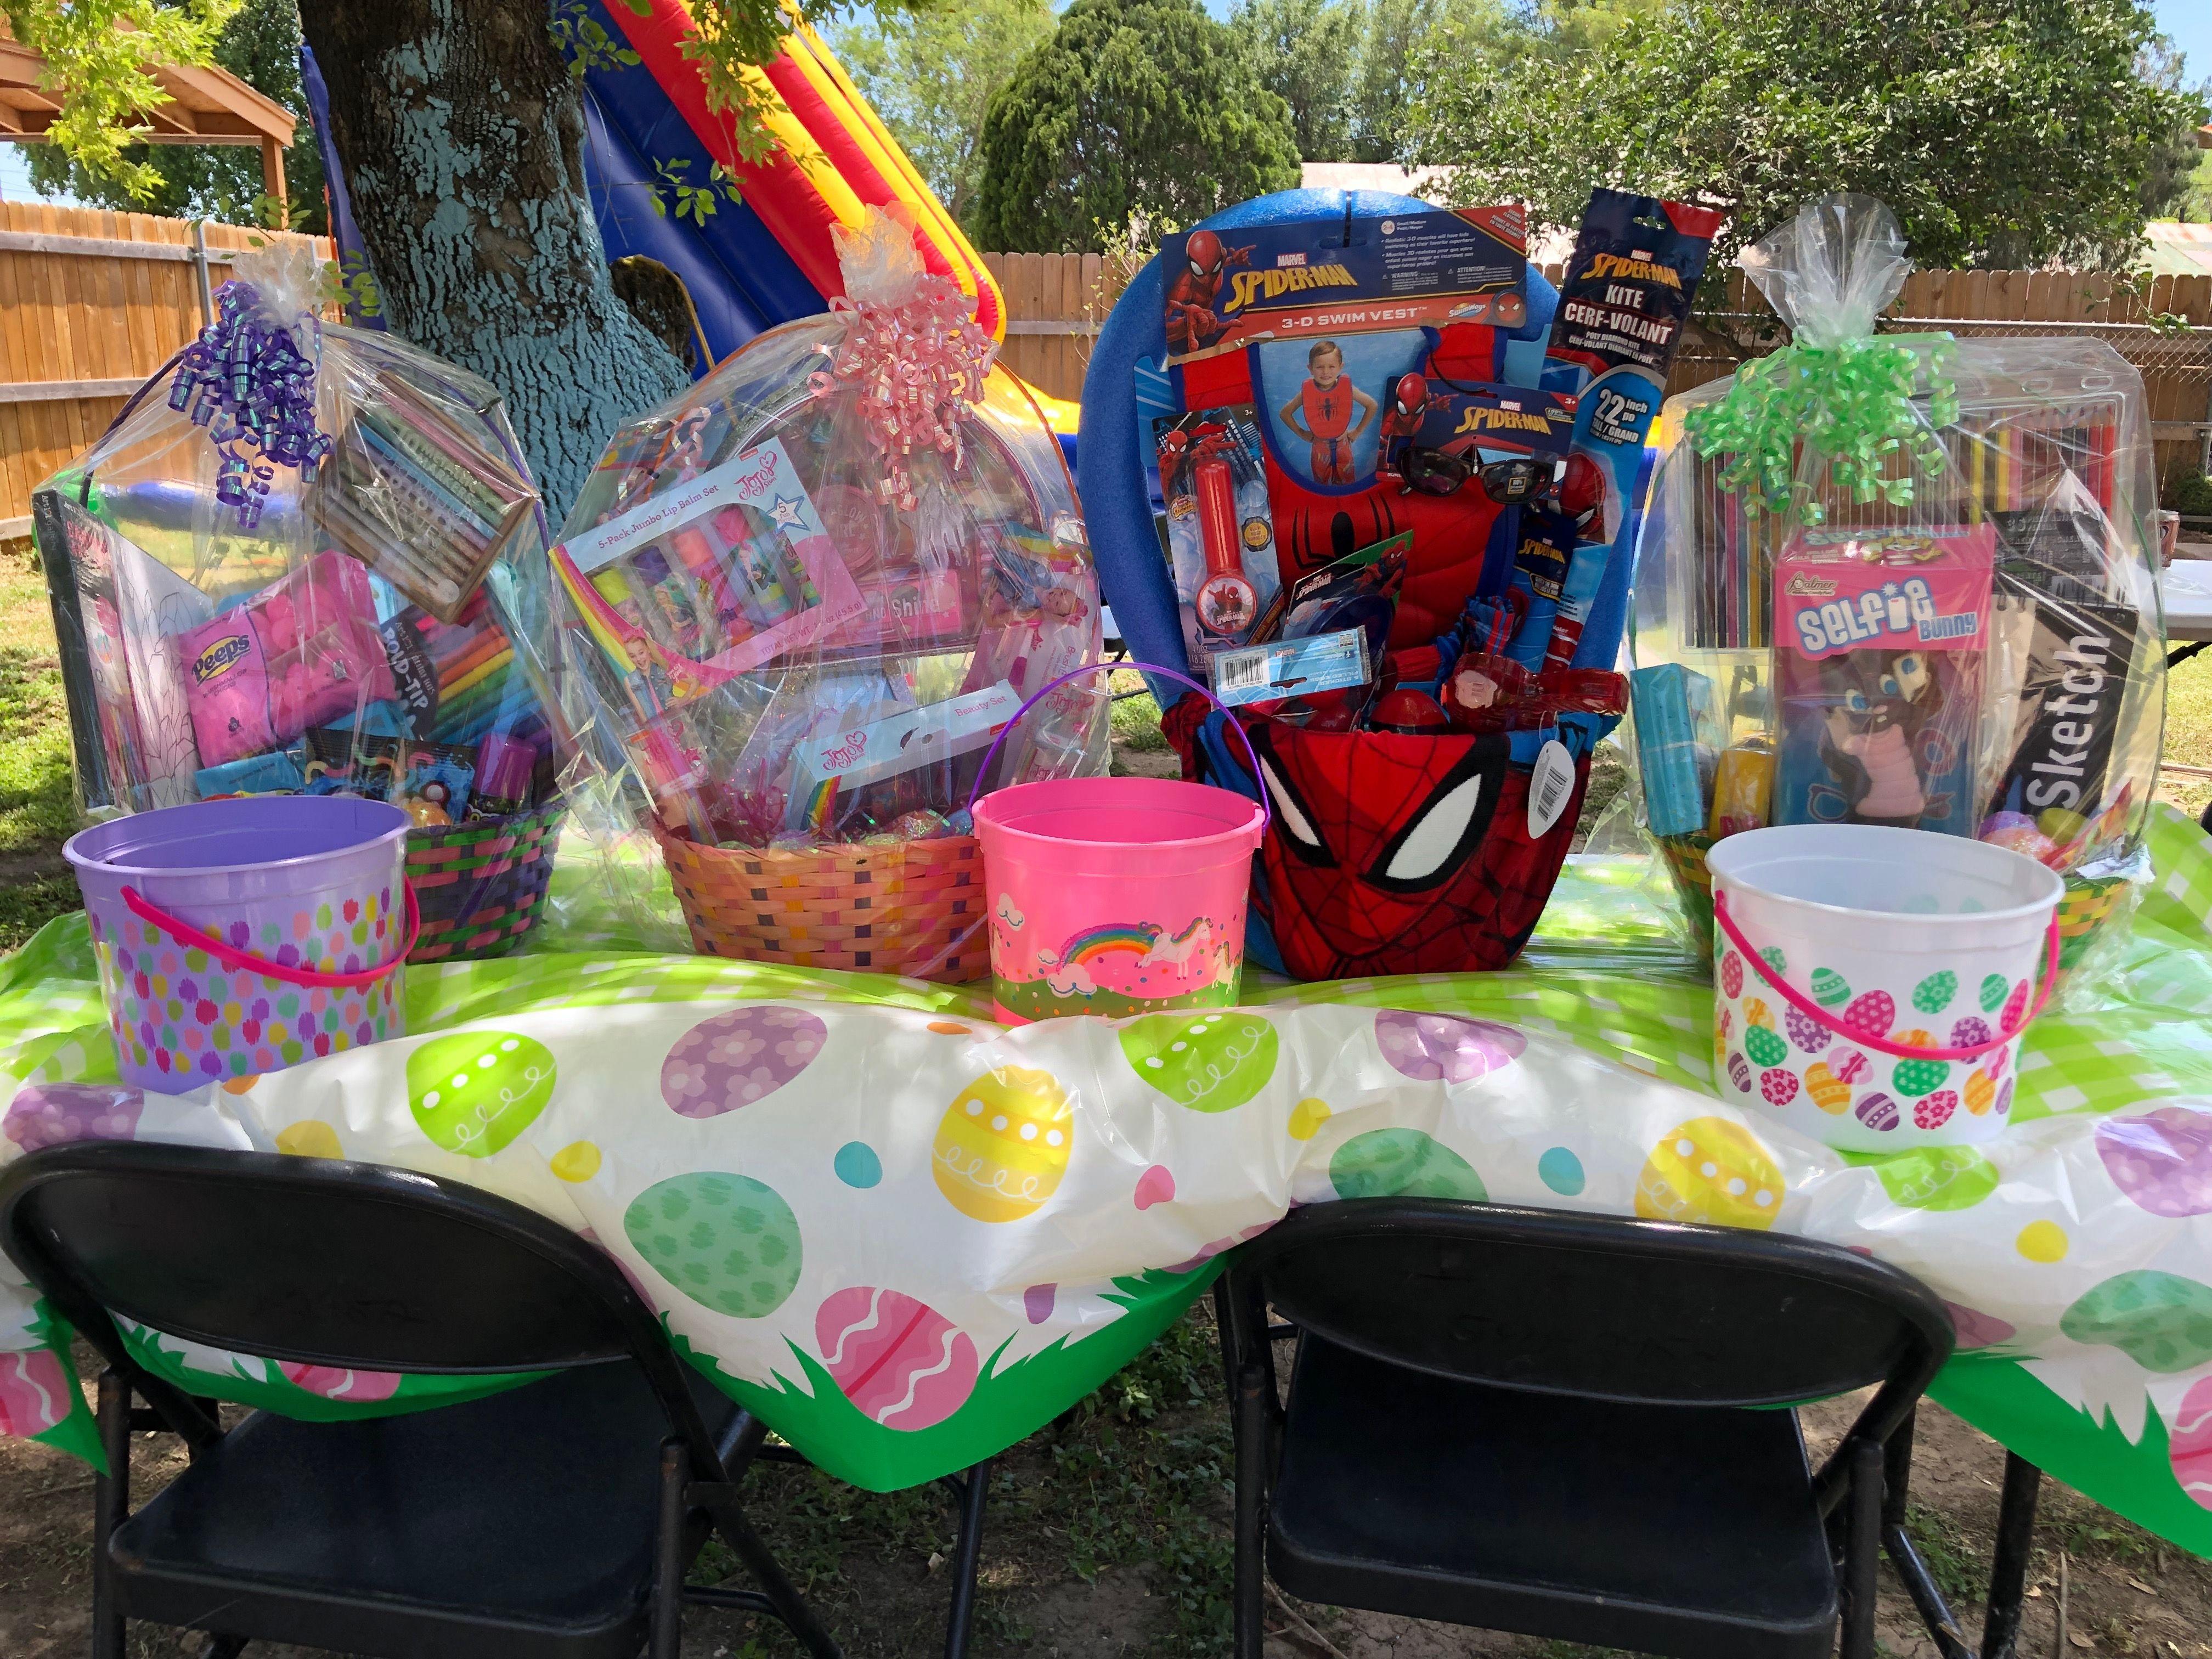 Easter baskets family easter party easter basket diy